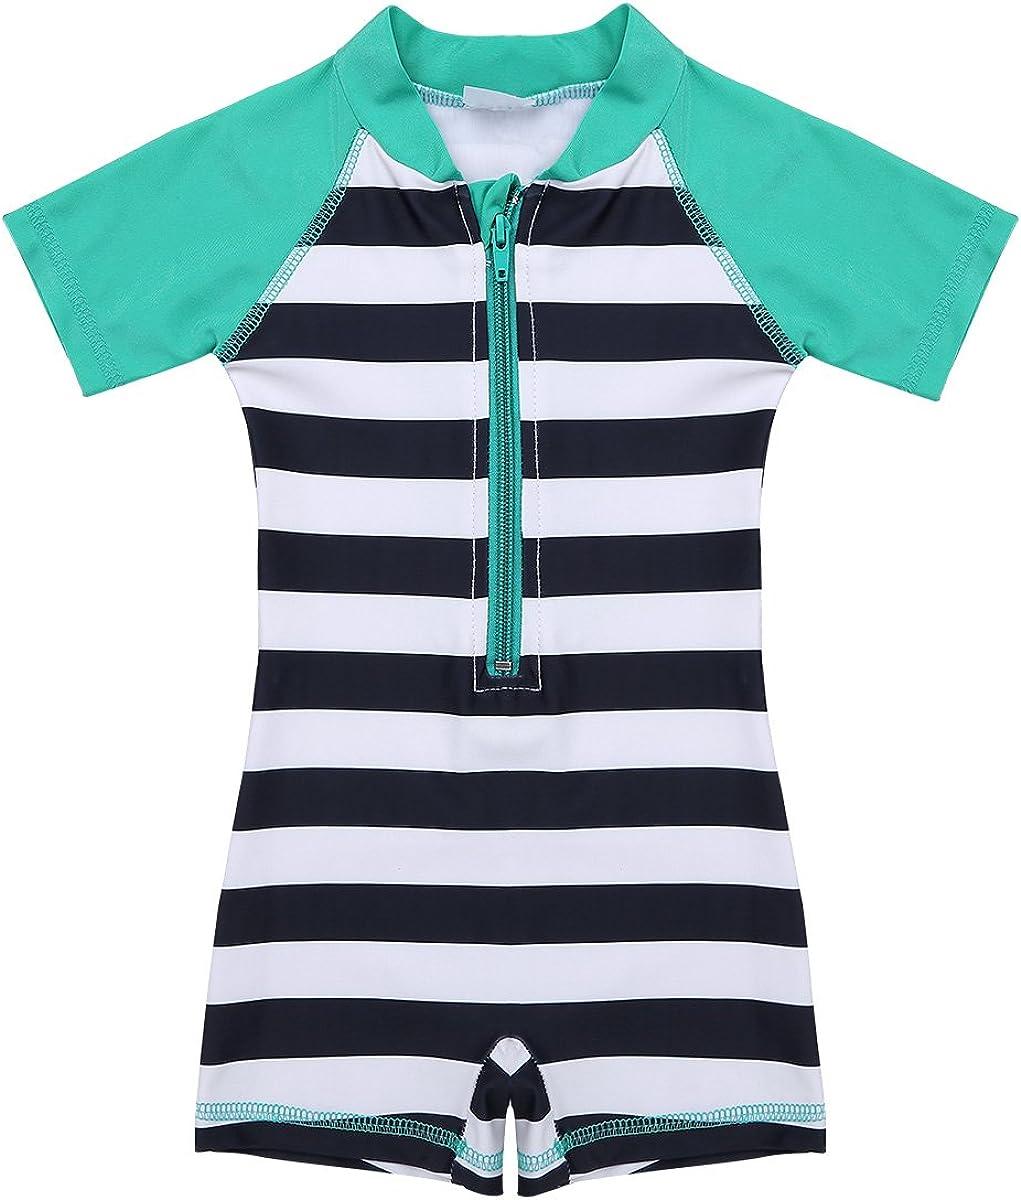 MSemis Infant Baby Boys Girls Rash Shark Printed Stripe Limited Under blast sales time trial price Pattern